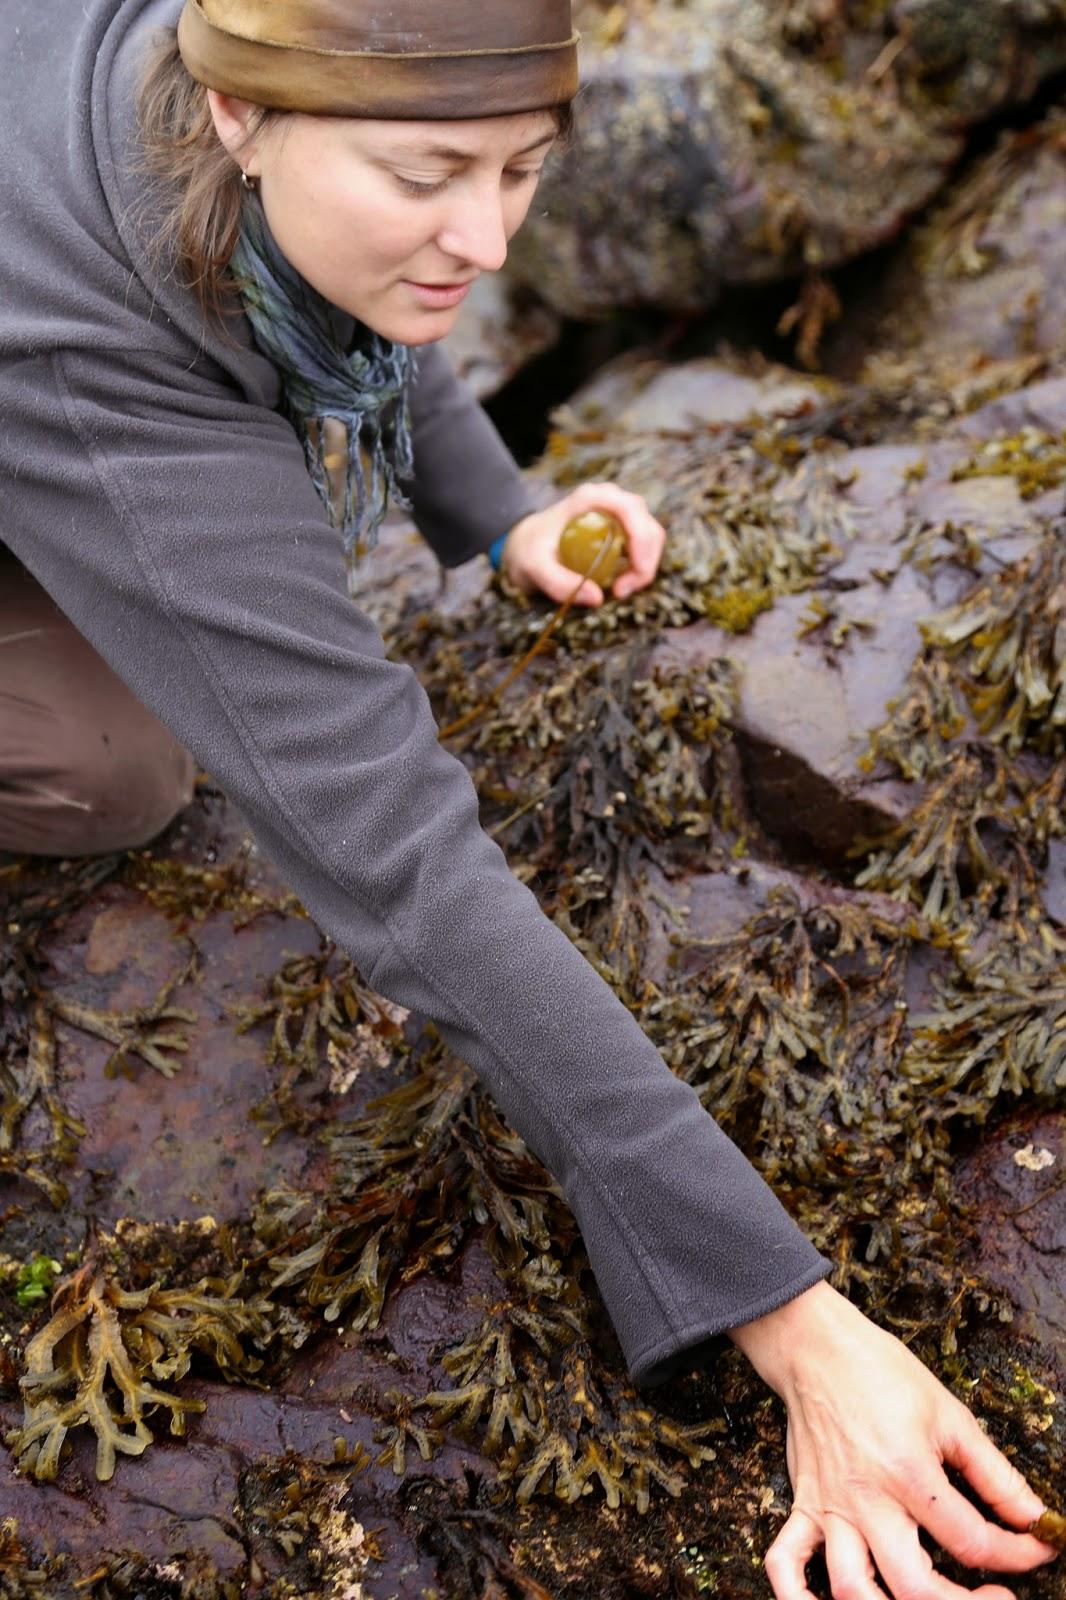 Hope Merritt seaweed forager, , Alaska pic: Kerstin Rodgers/msmarmitelover.com